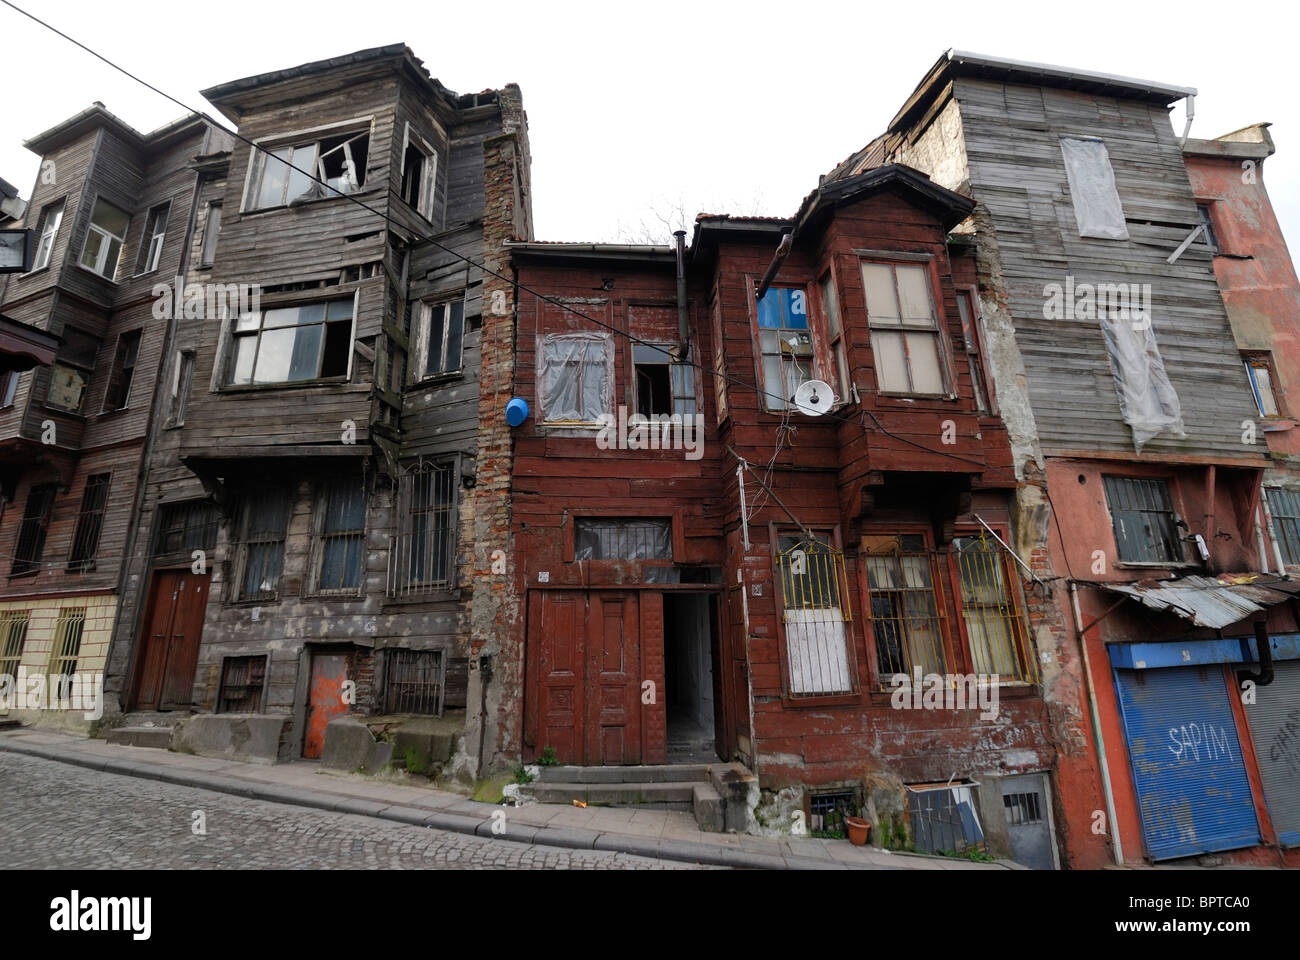 Istanbul. Turkei. Baufälligen osmanischen Ära Holzbauten im Stadtteil Süleymaniye. Stockbild